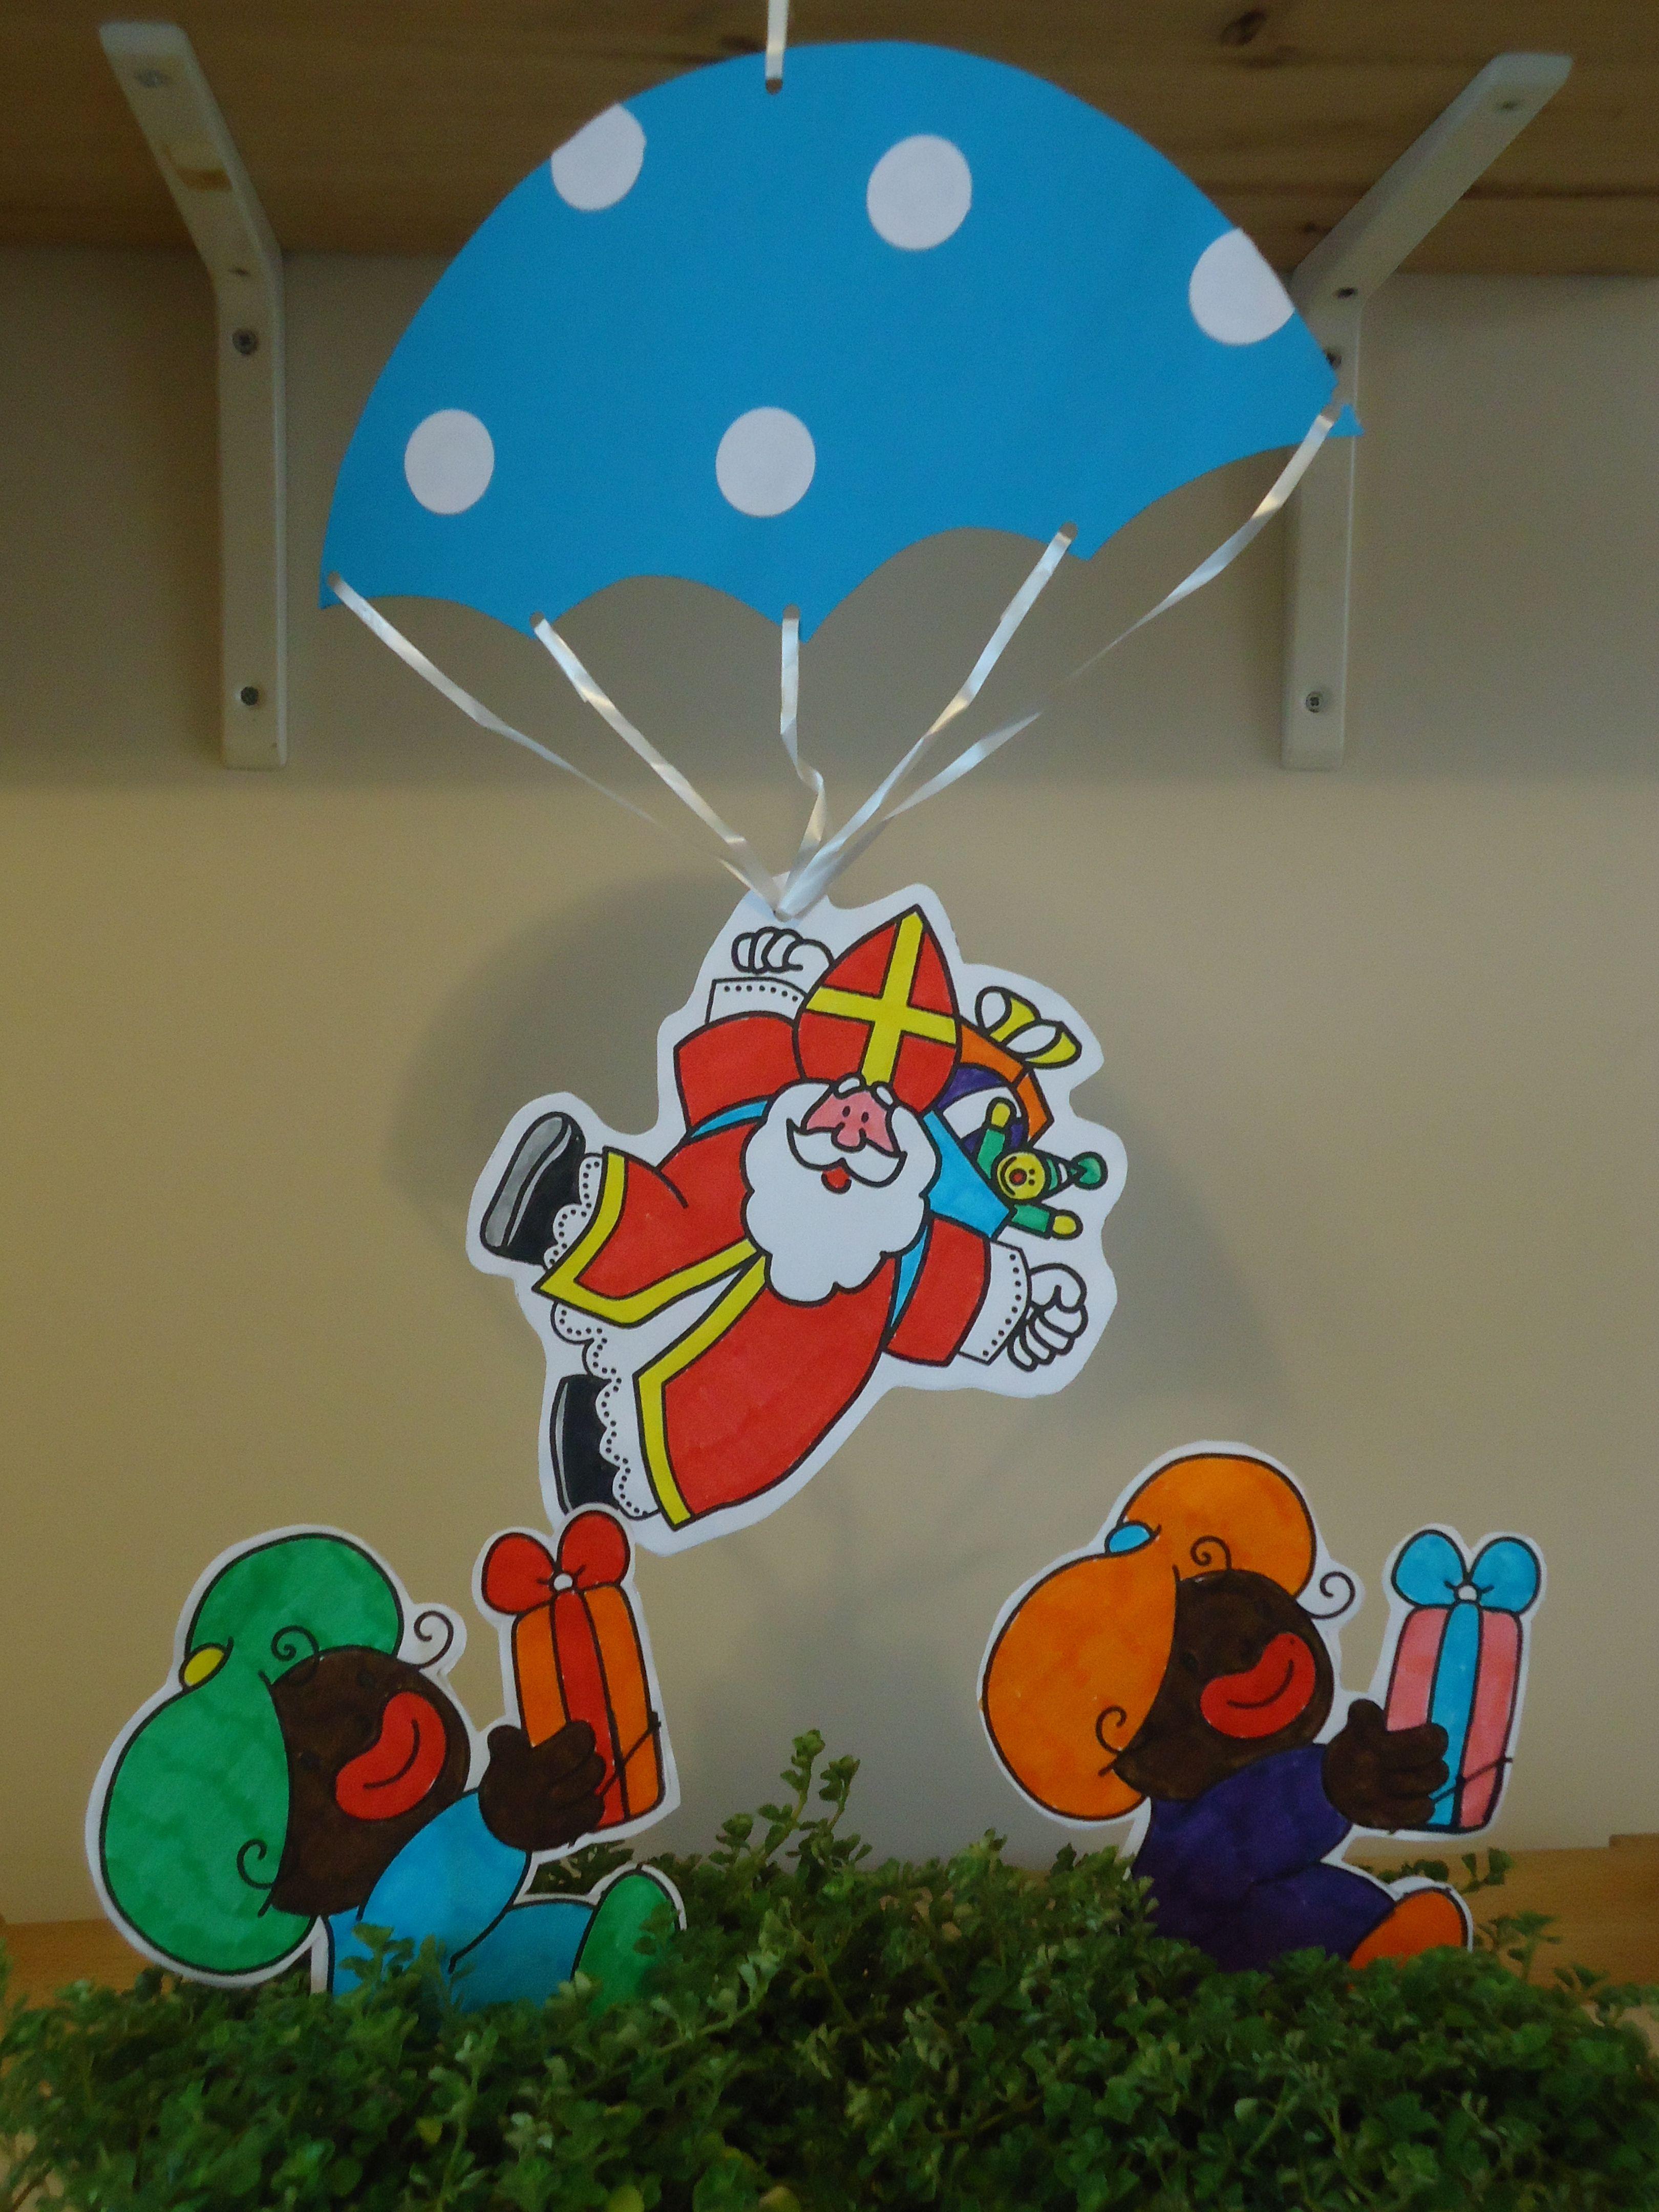 sint aan parachute leuke kleurplaat opzoek evt